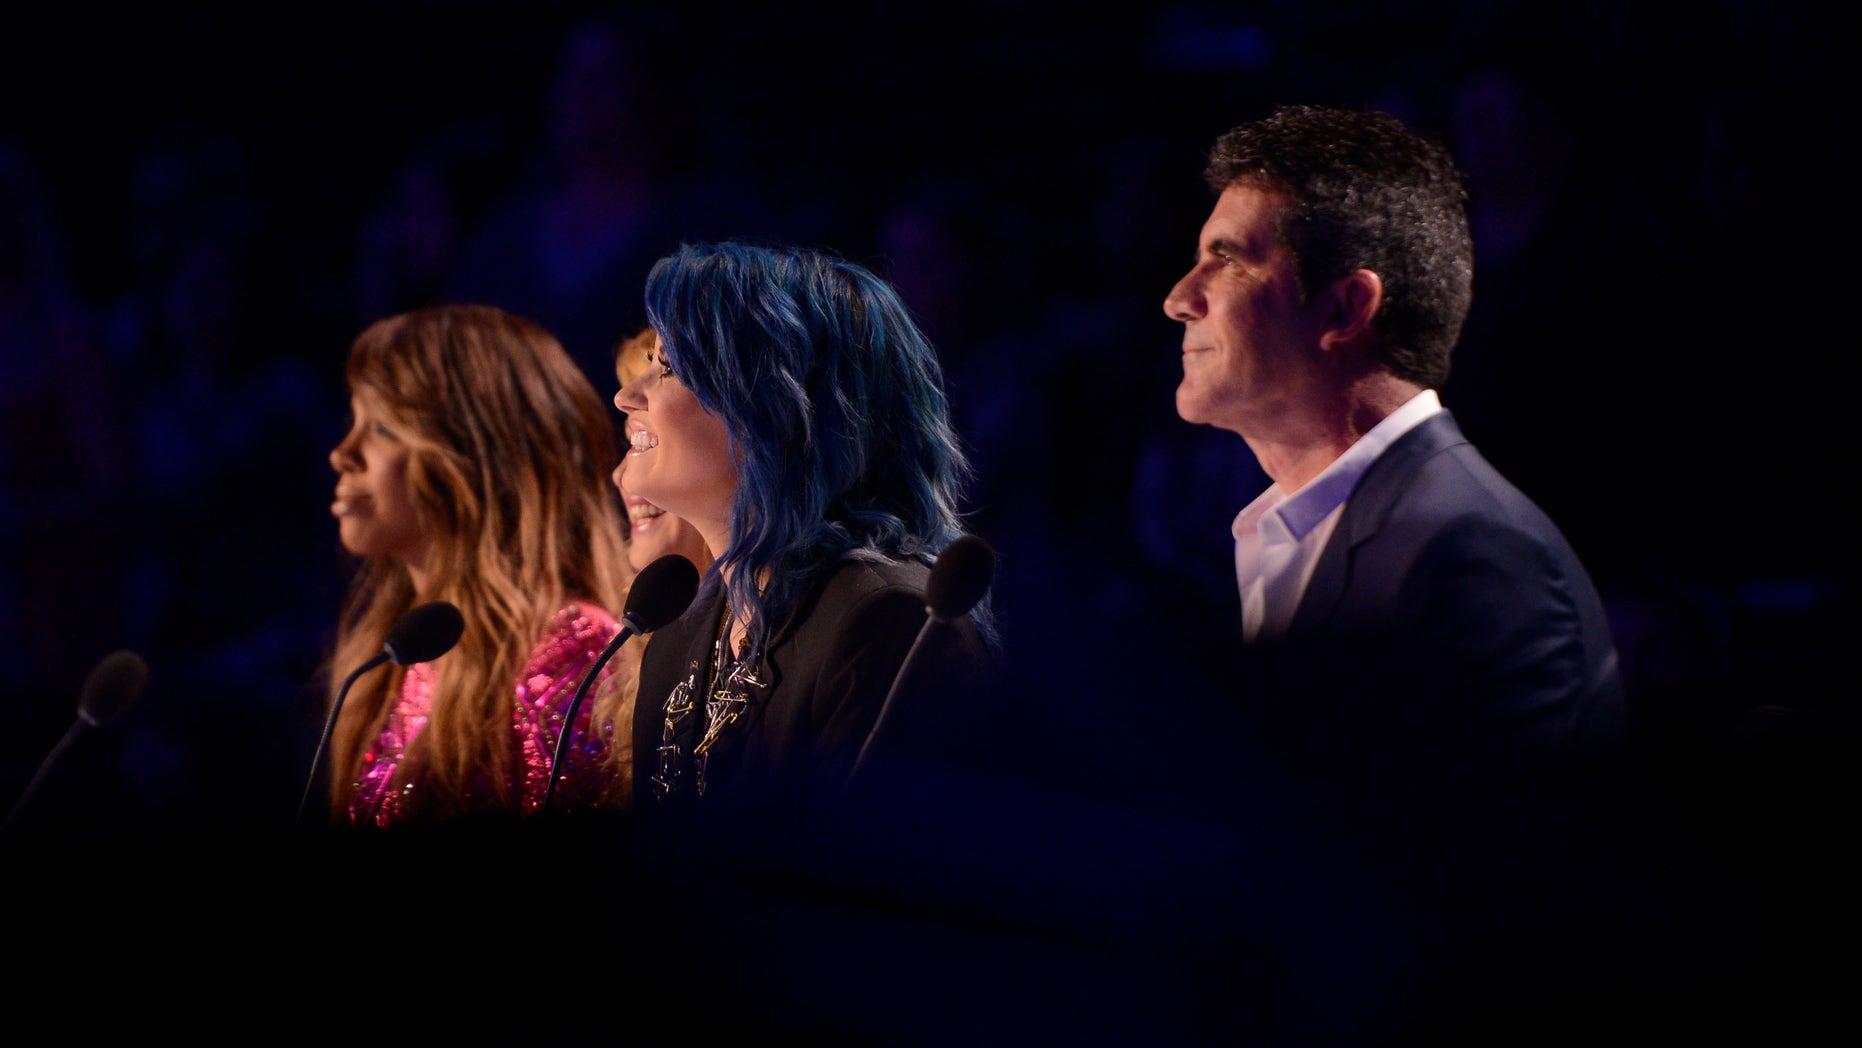 Kelly Rowland, Paulina Rubio, Demi Lovato and Simon Cowell on THE X FACTOR airing Thursday Nov. 21, 2013.